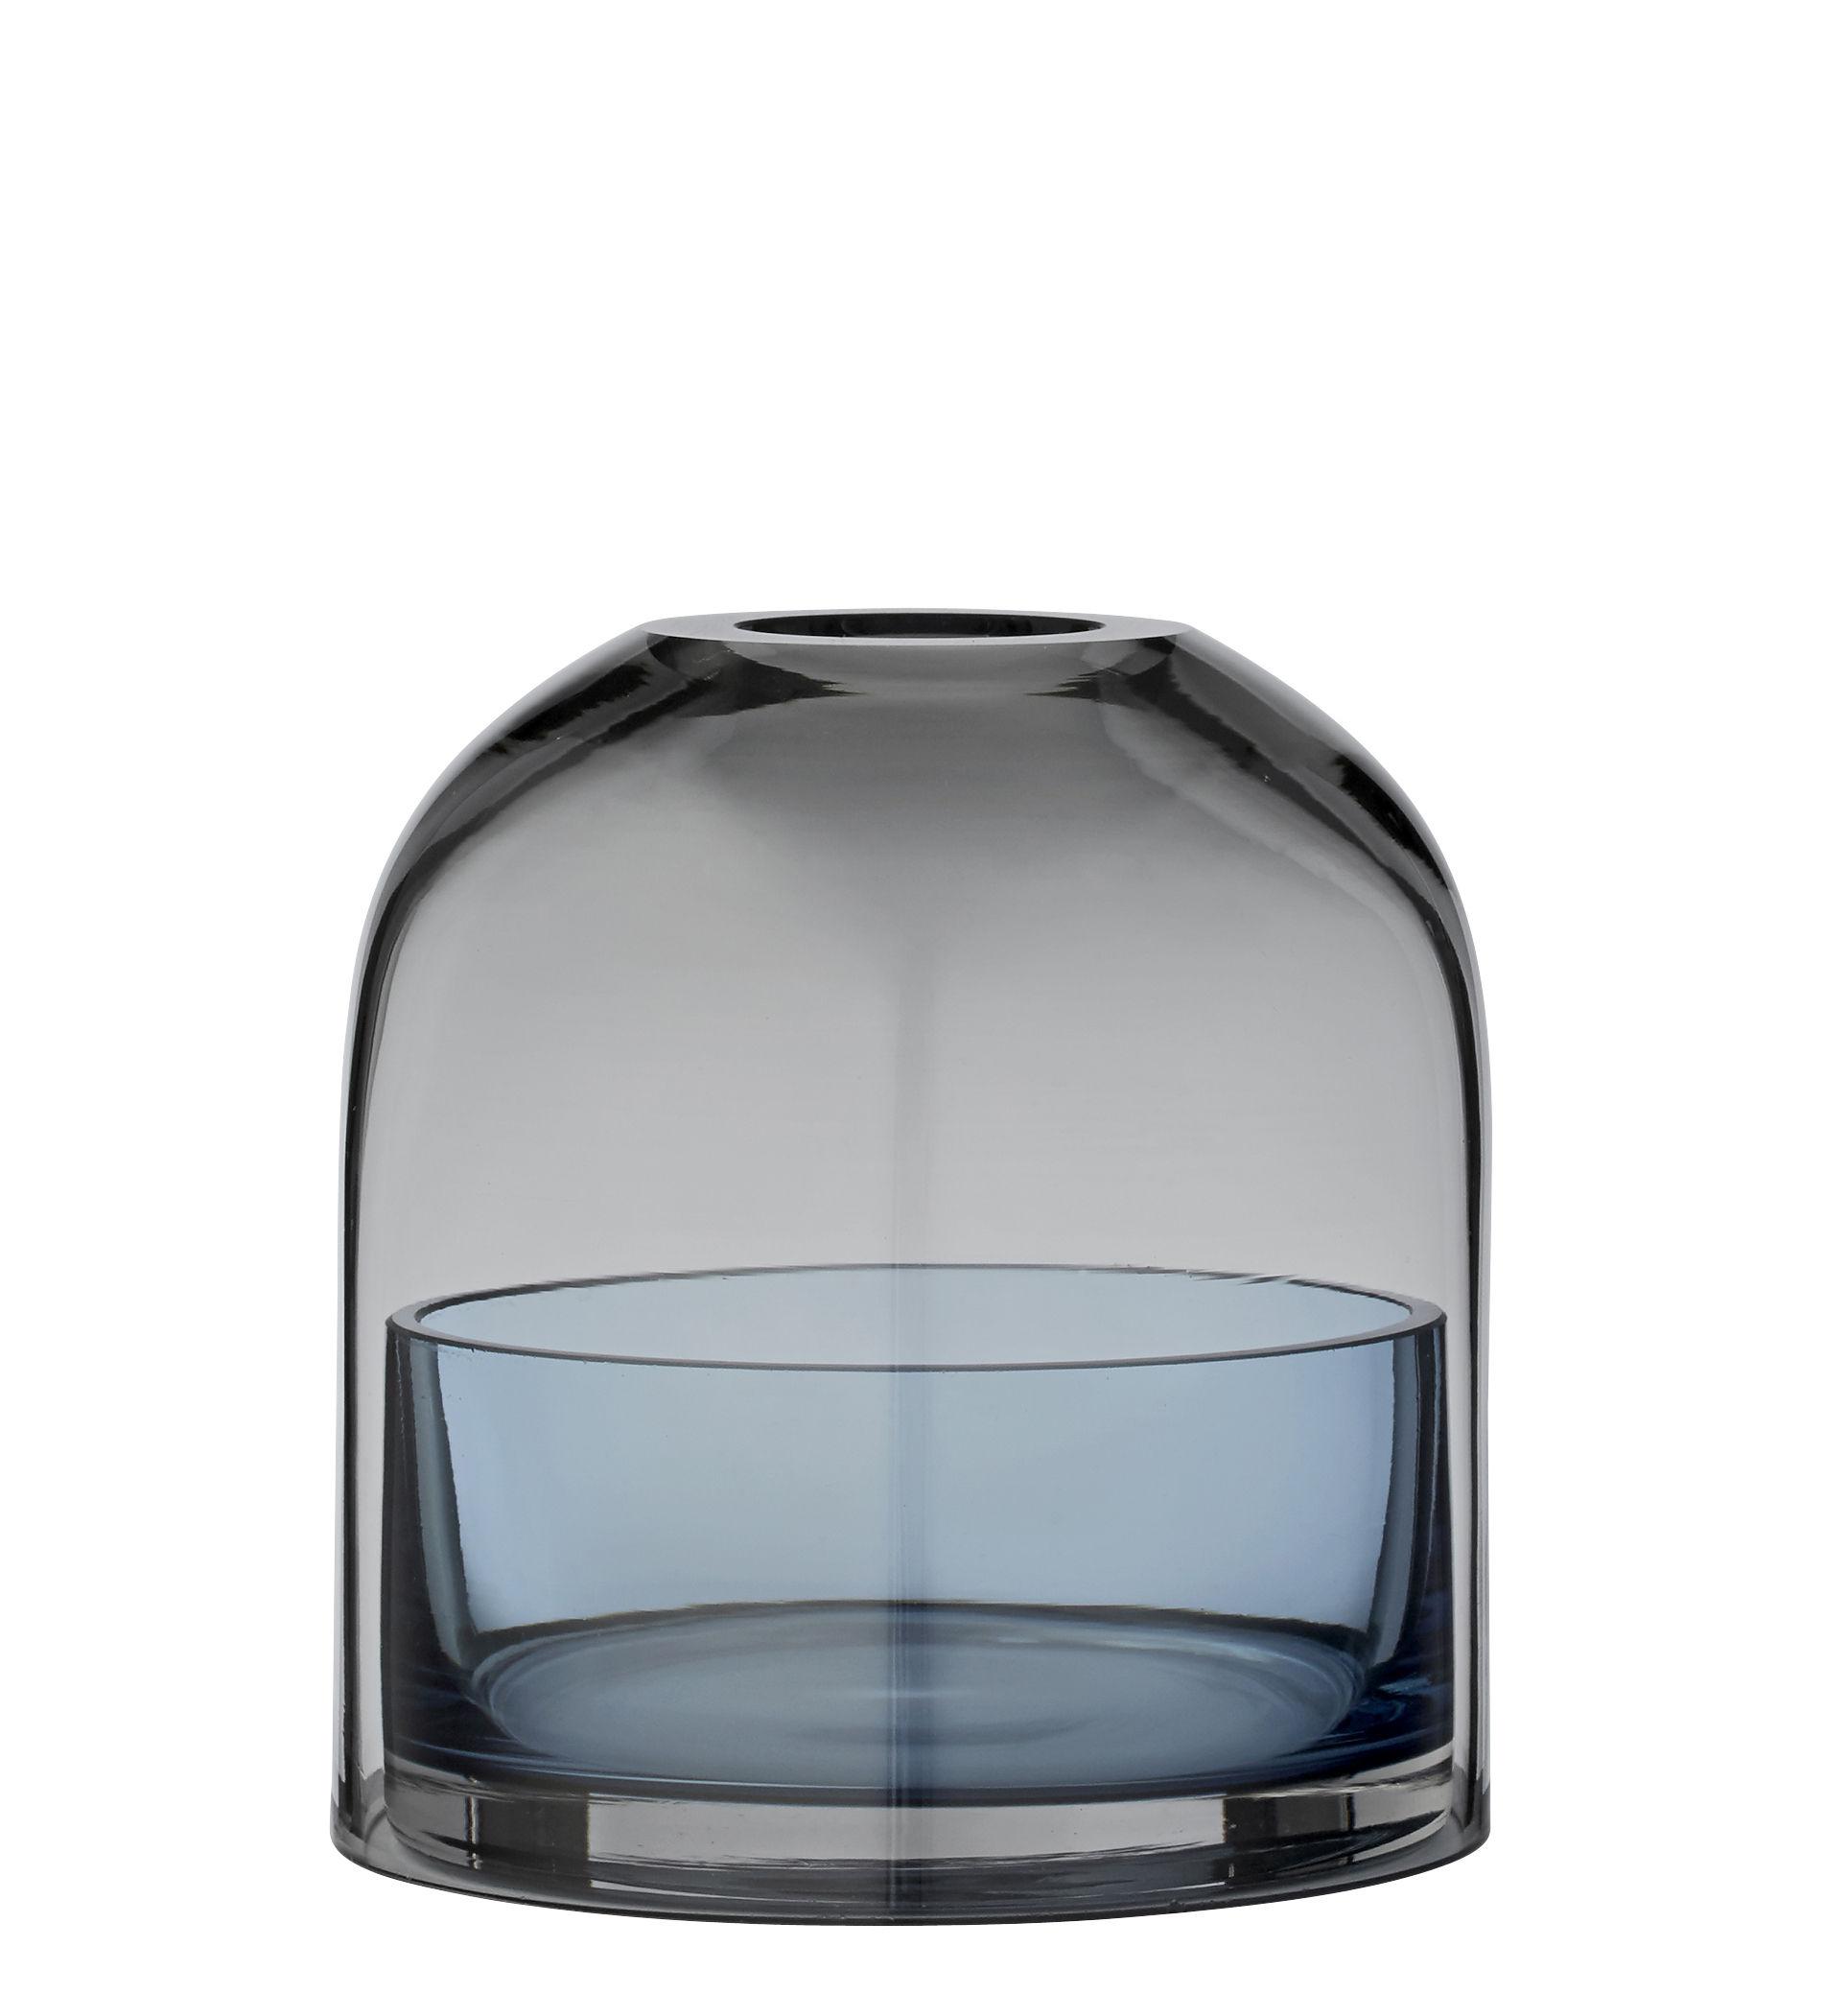 Interni - Candele, Portacandele, Lampade - Portacandela Tota Small - / Vetro - H 10 cm di AYTM - Grigio fumé / Coppetta blu - Vetro